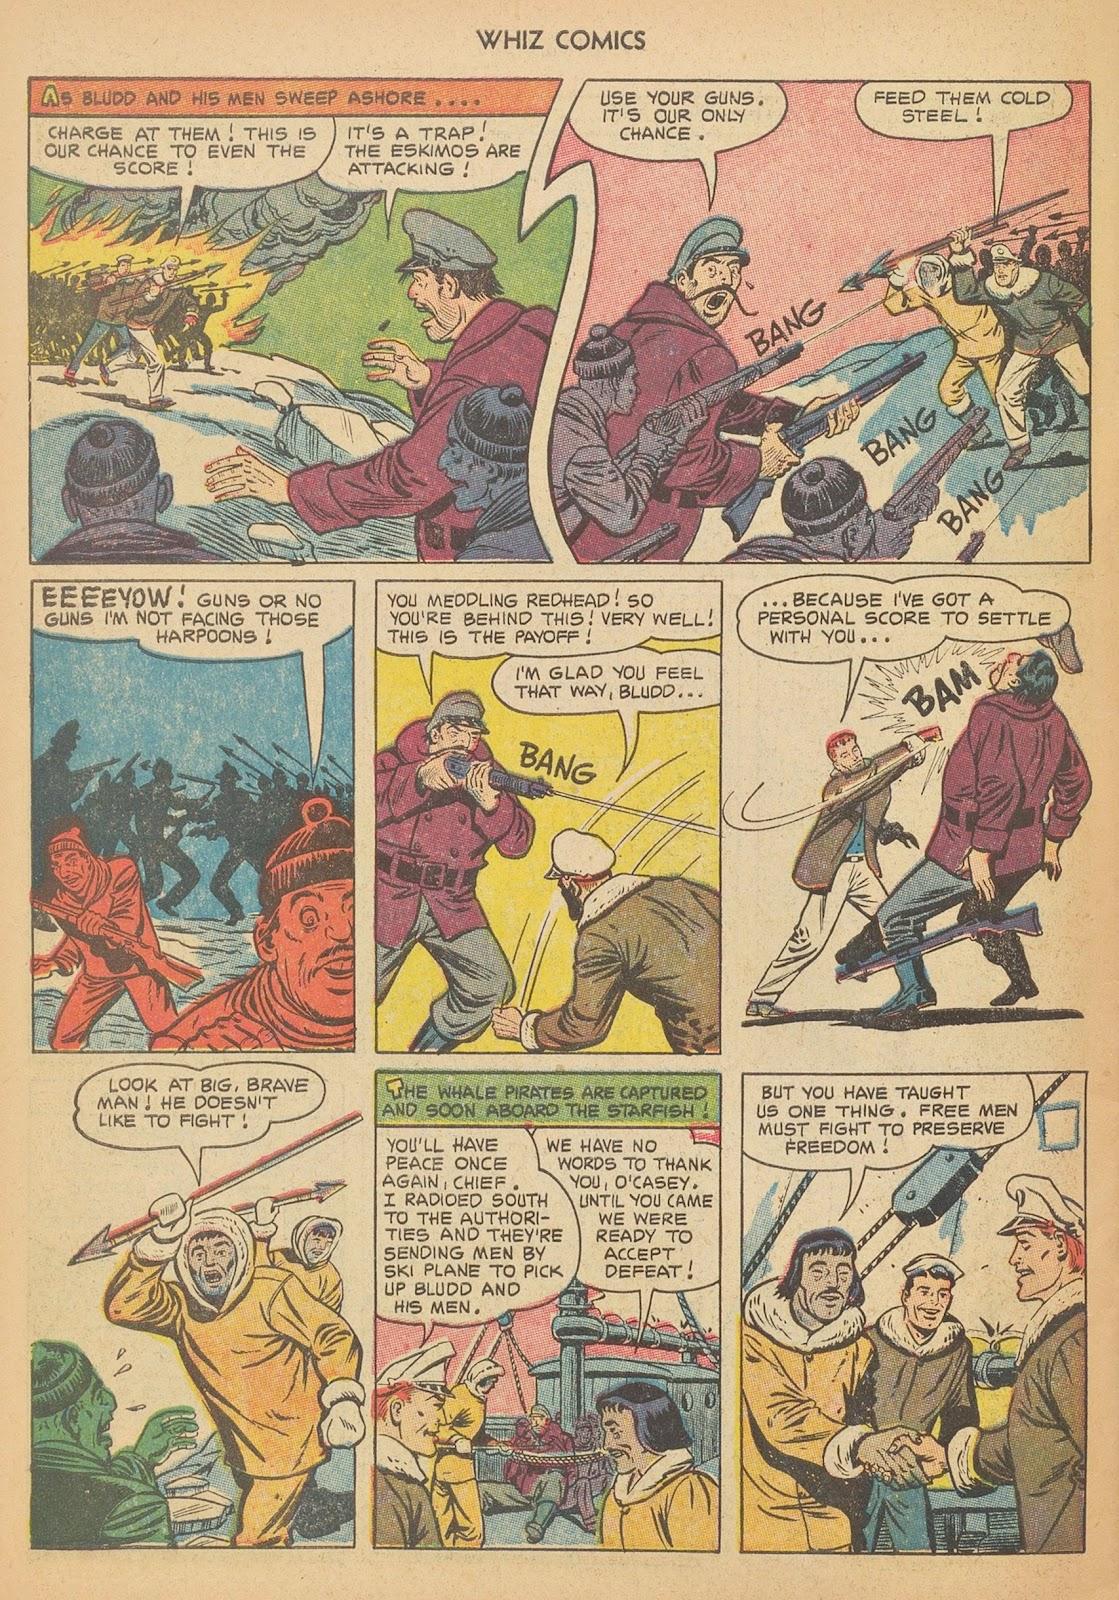 Read online WHIZ Comics comic -  Issue #153 - 34